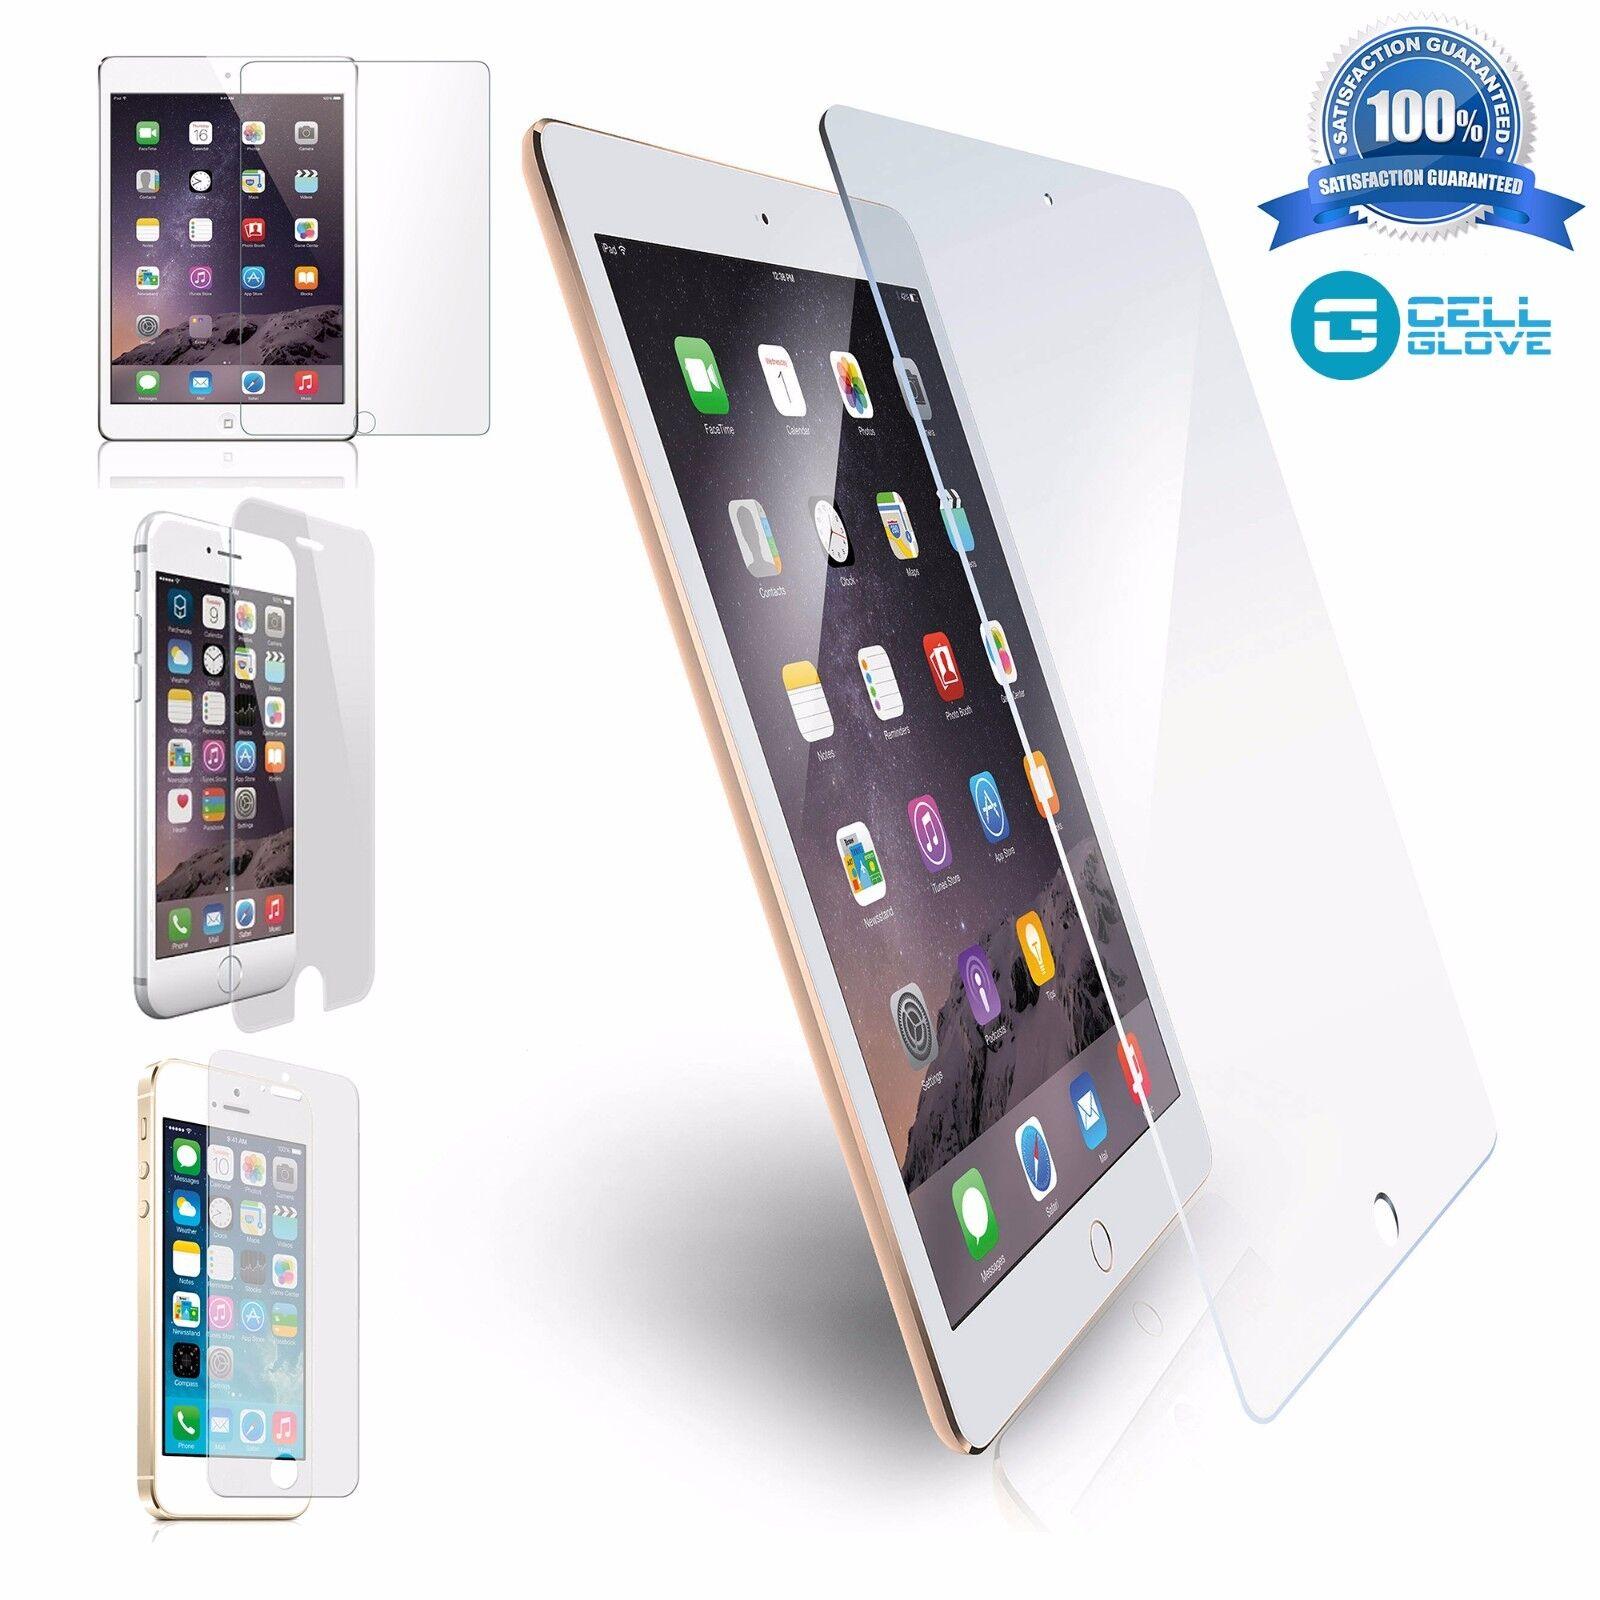 9H Premium HD Tempered Glass Screen Protector for Apple iPad 4 3 2/&Mini /&Air